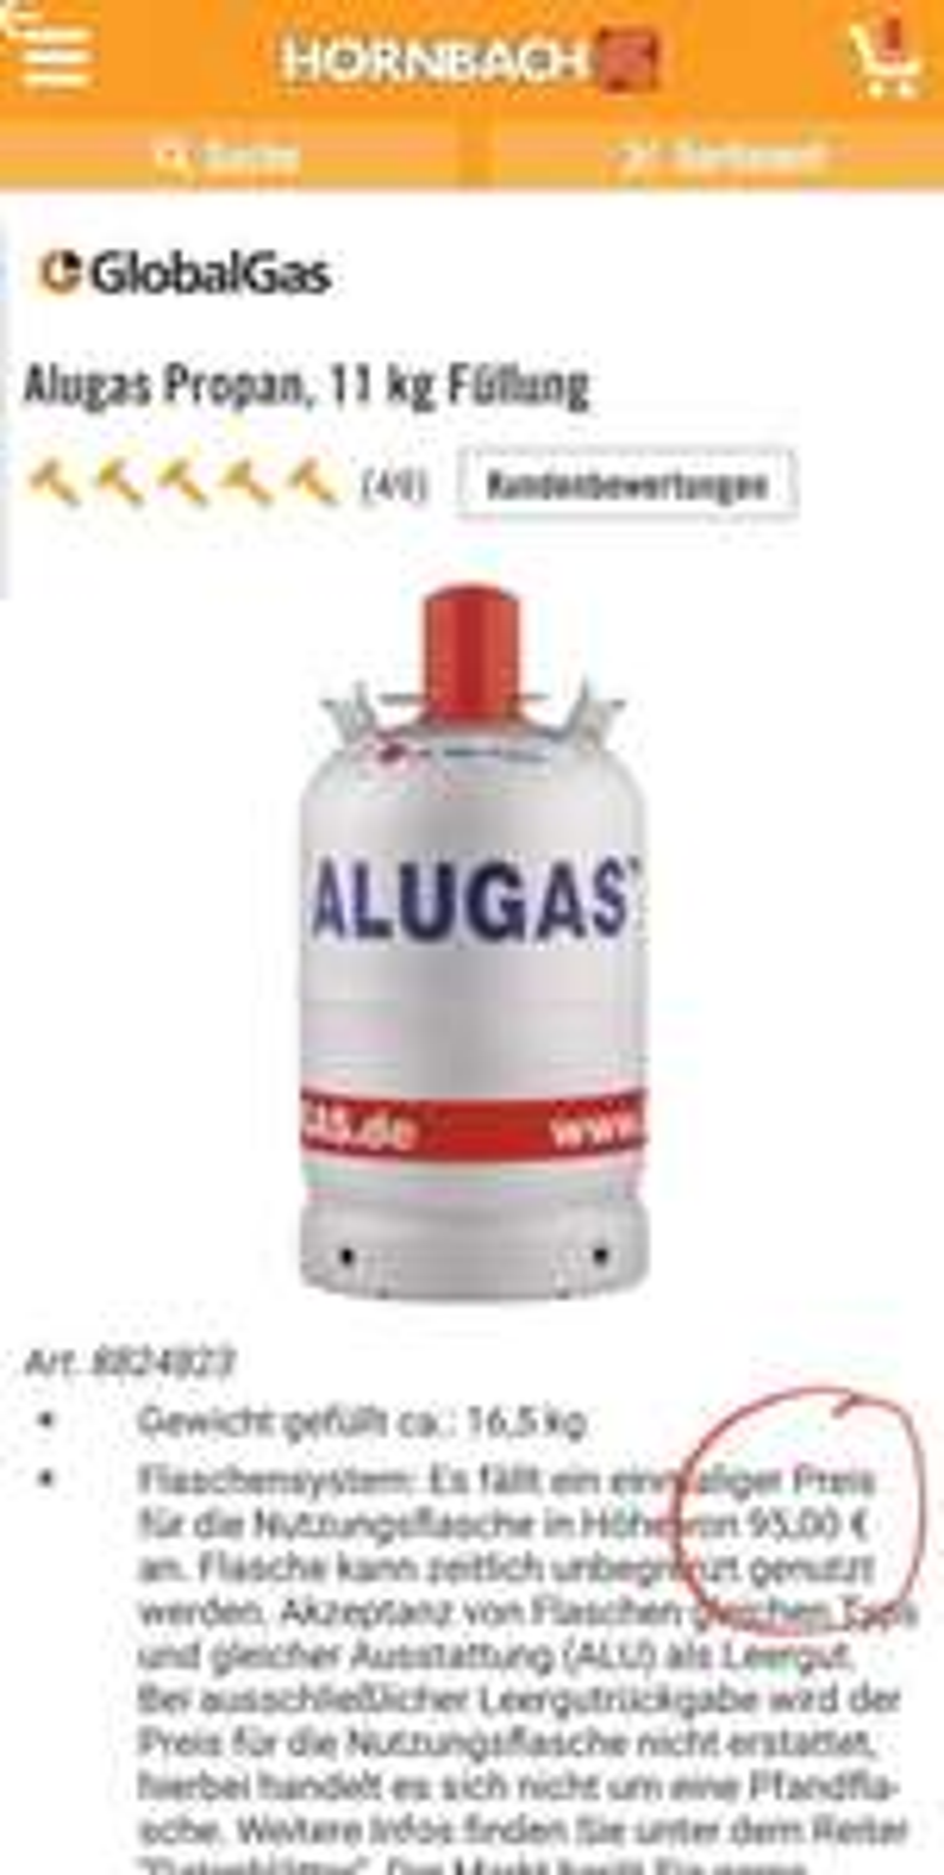 ALUGAS Gasflasche 11KG Leer Lokal Propangas Propangasflasche